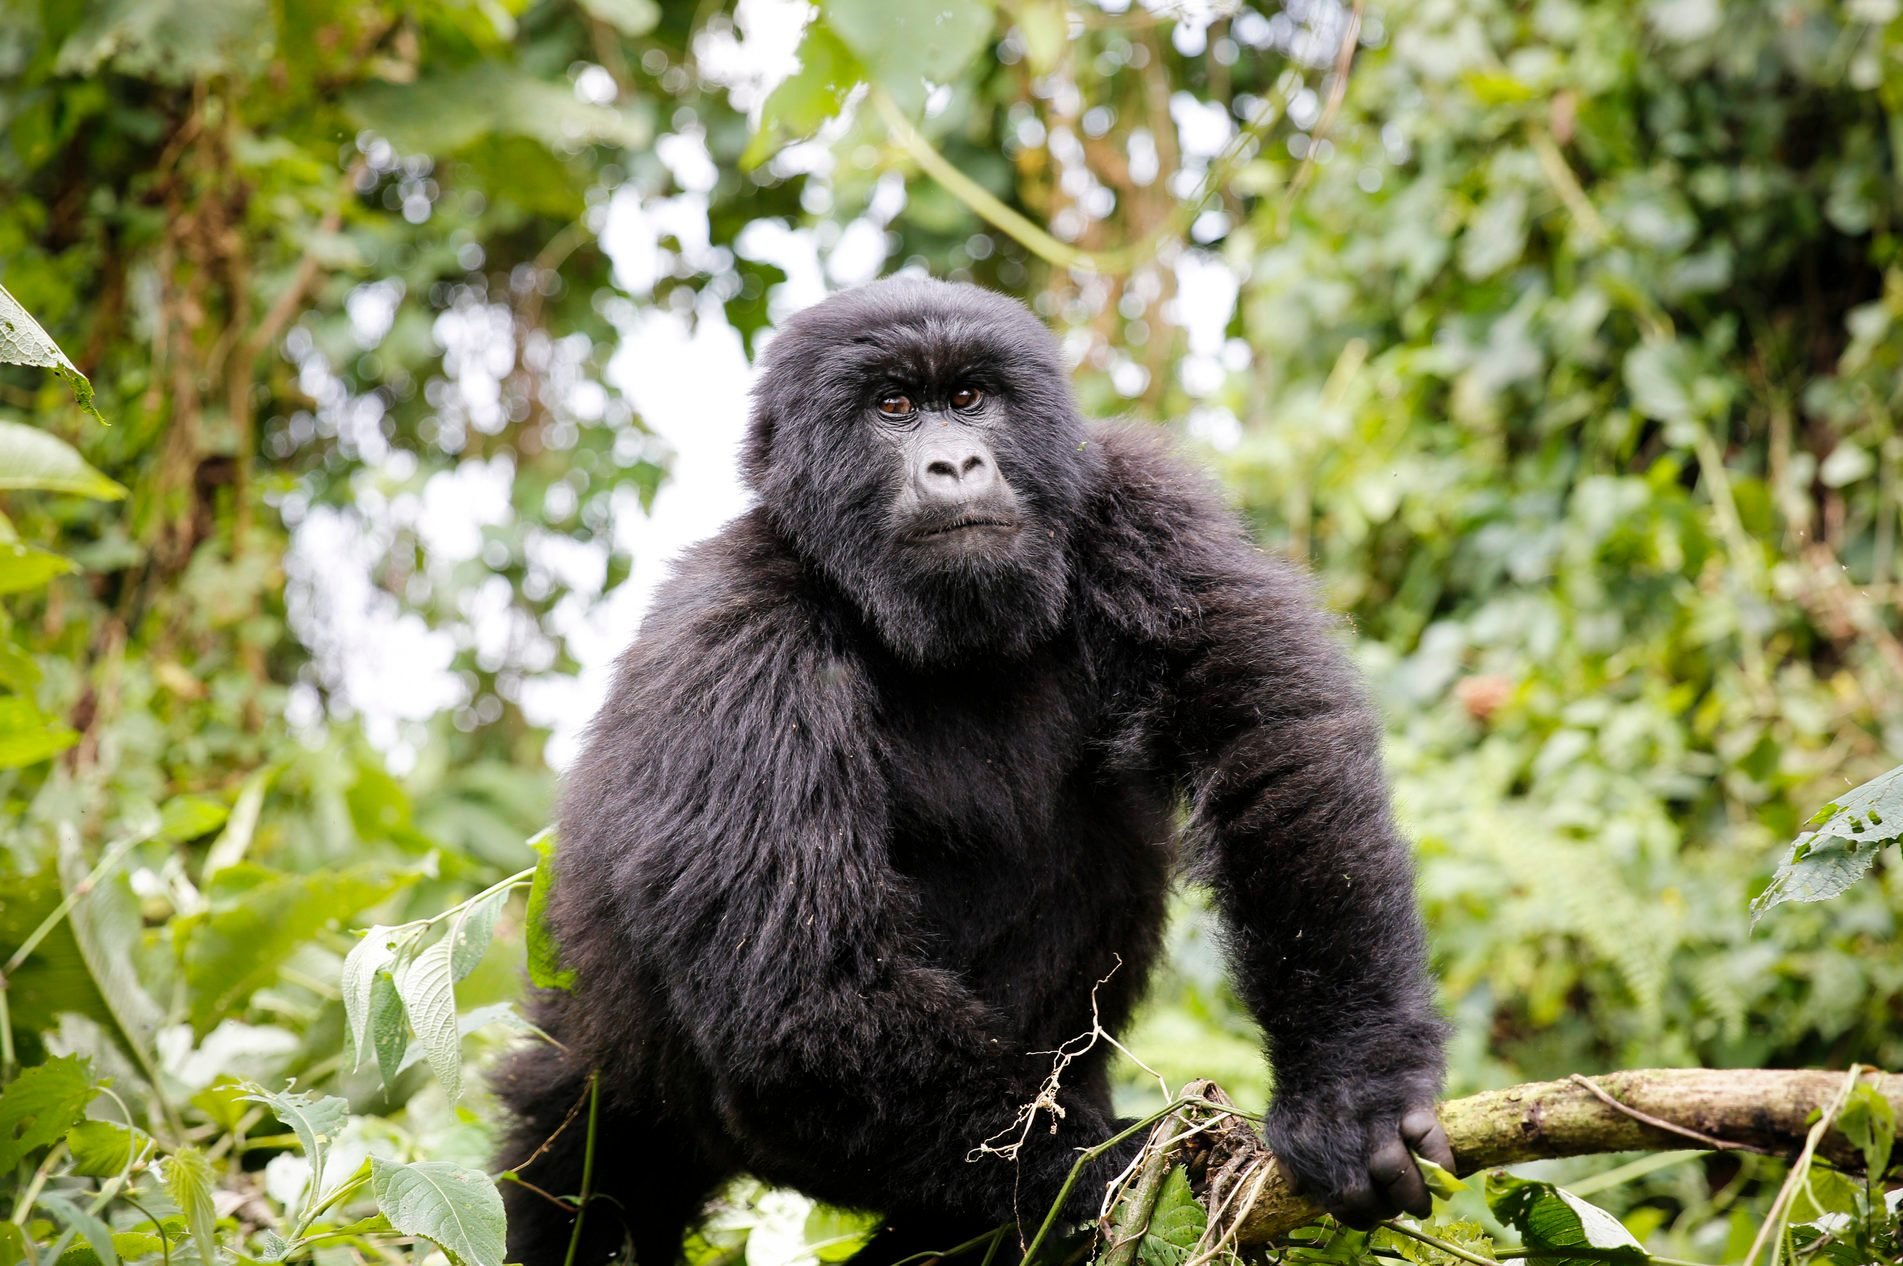 Africa, Democratic Republic of Congo, Mountain gorilla in jungle